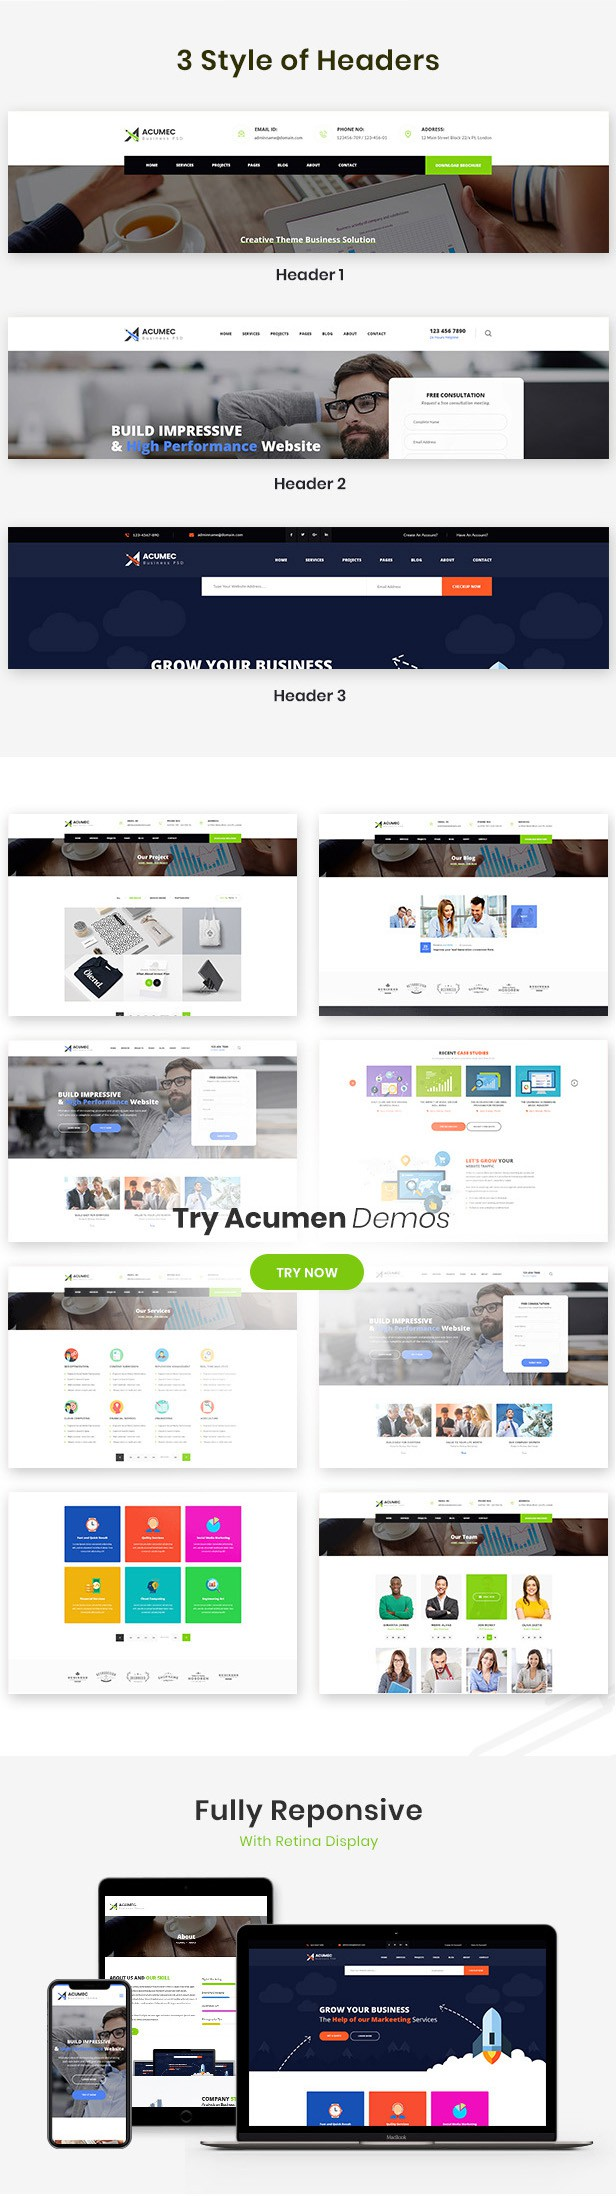 Acumec - Business Multipurpose WordPress Theme - 11